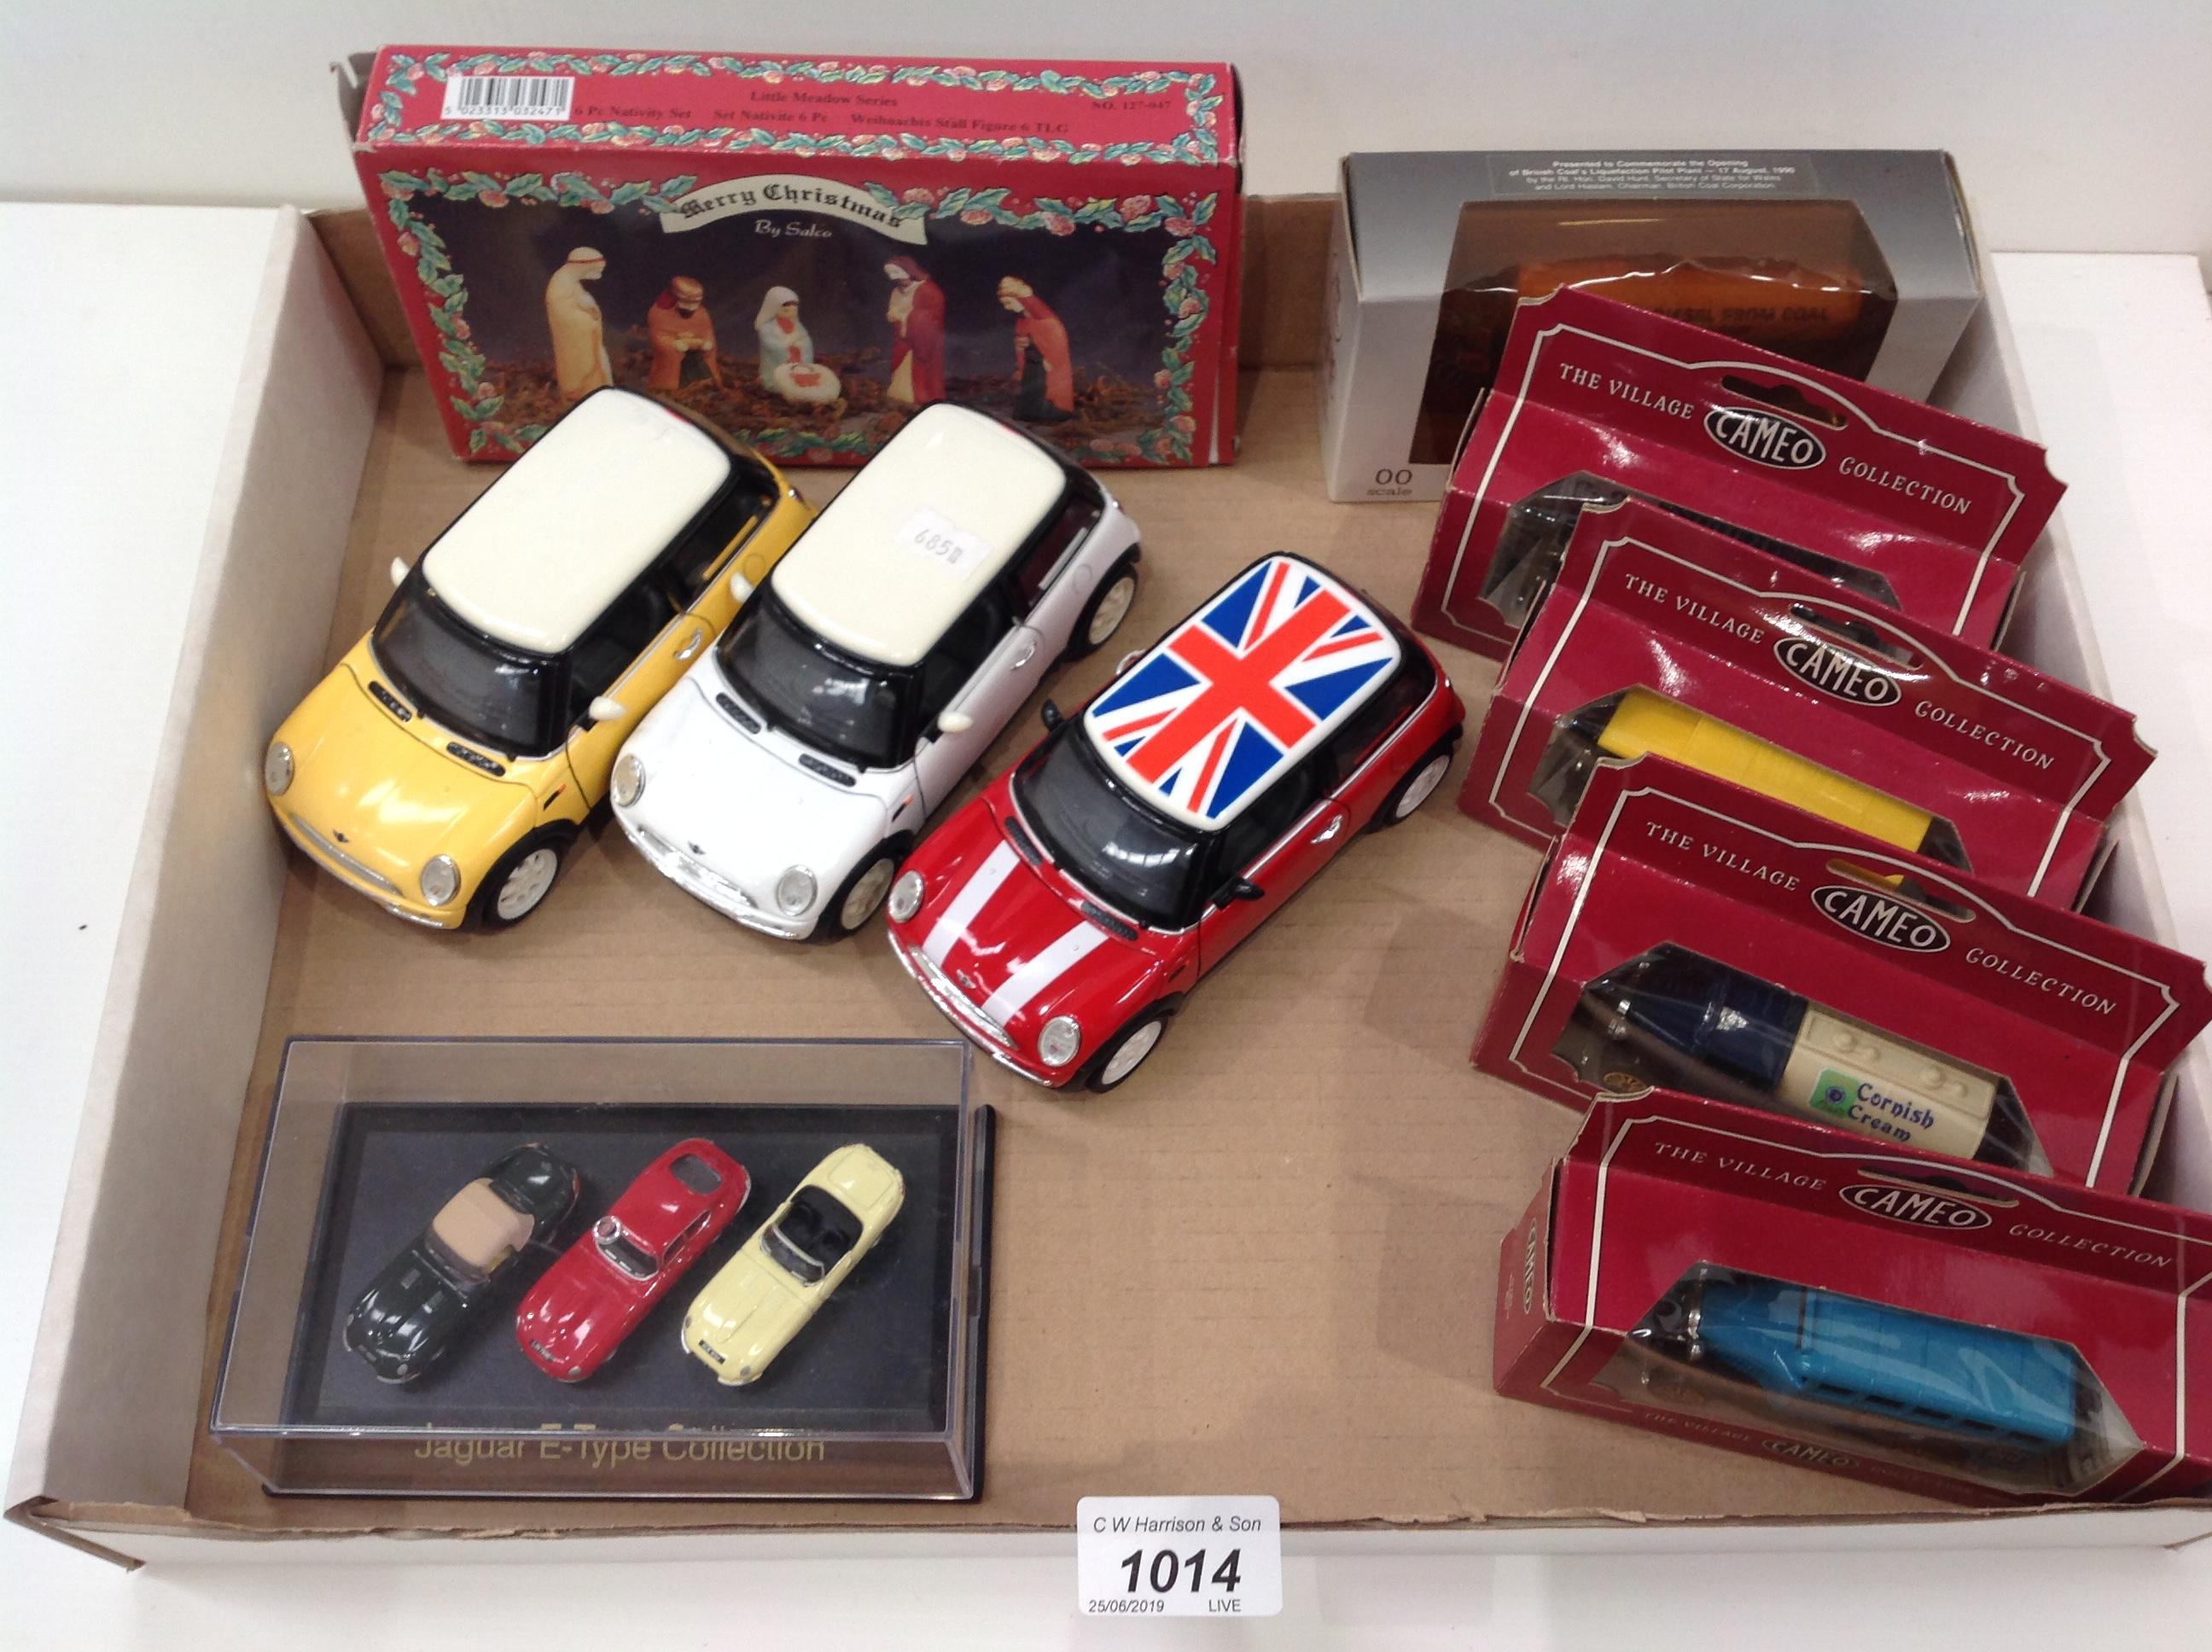 Lot 1014 - Three die cast 1:24 scale Mini Cooper cars (unboxed), a miniature Jaguar E-Type collection (boxed),